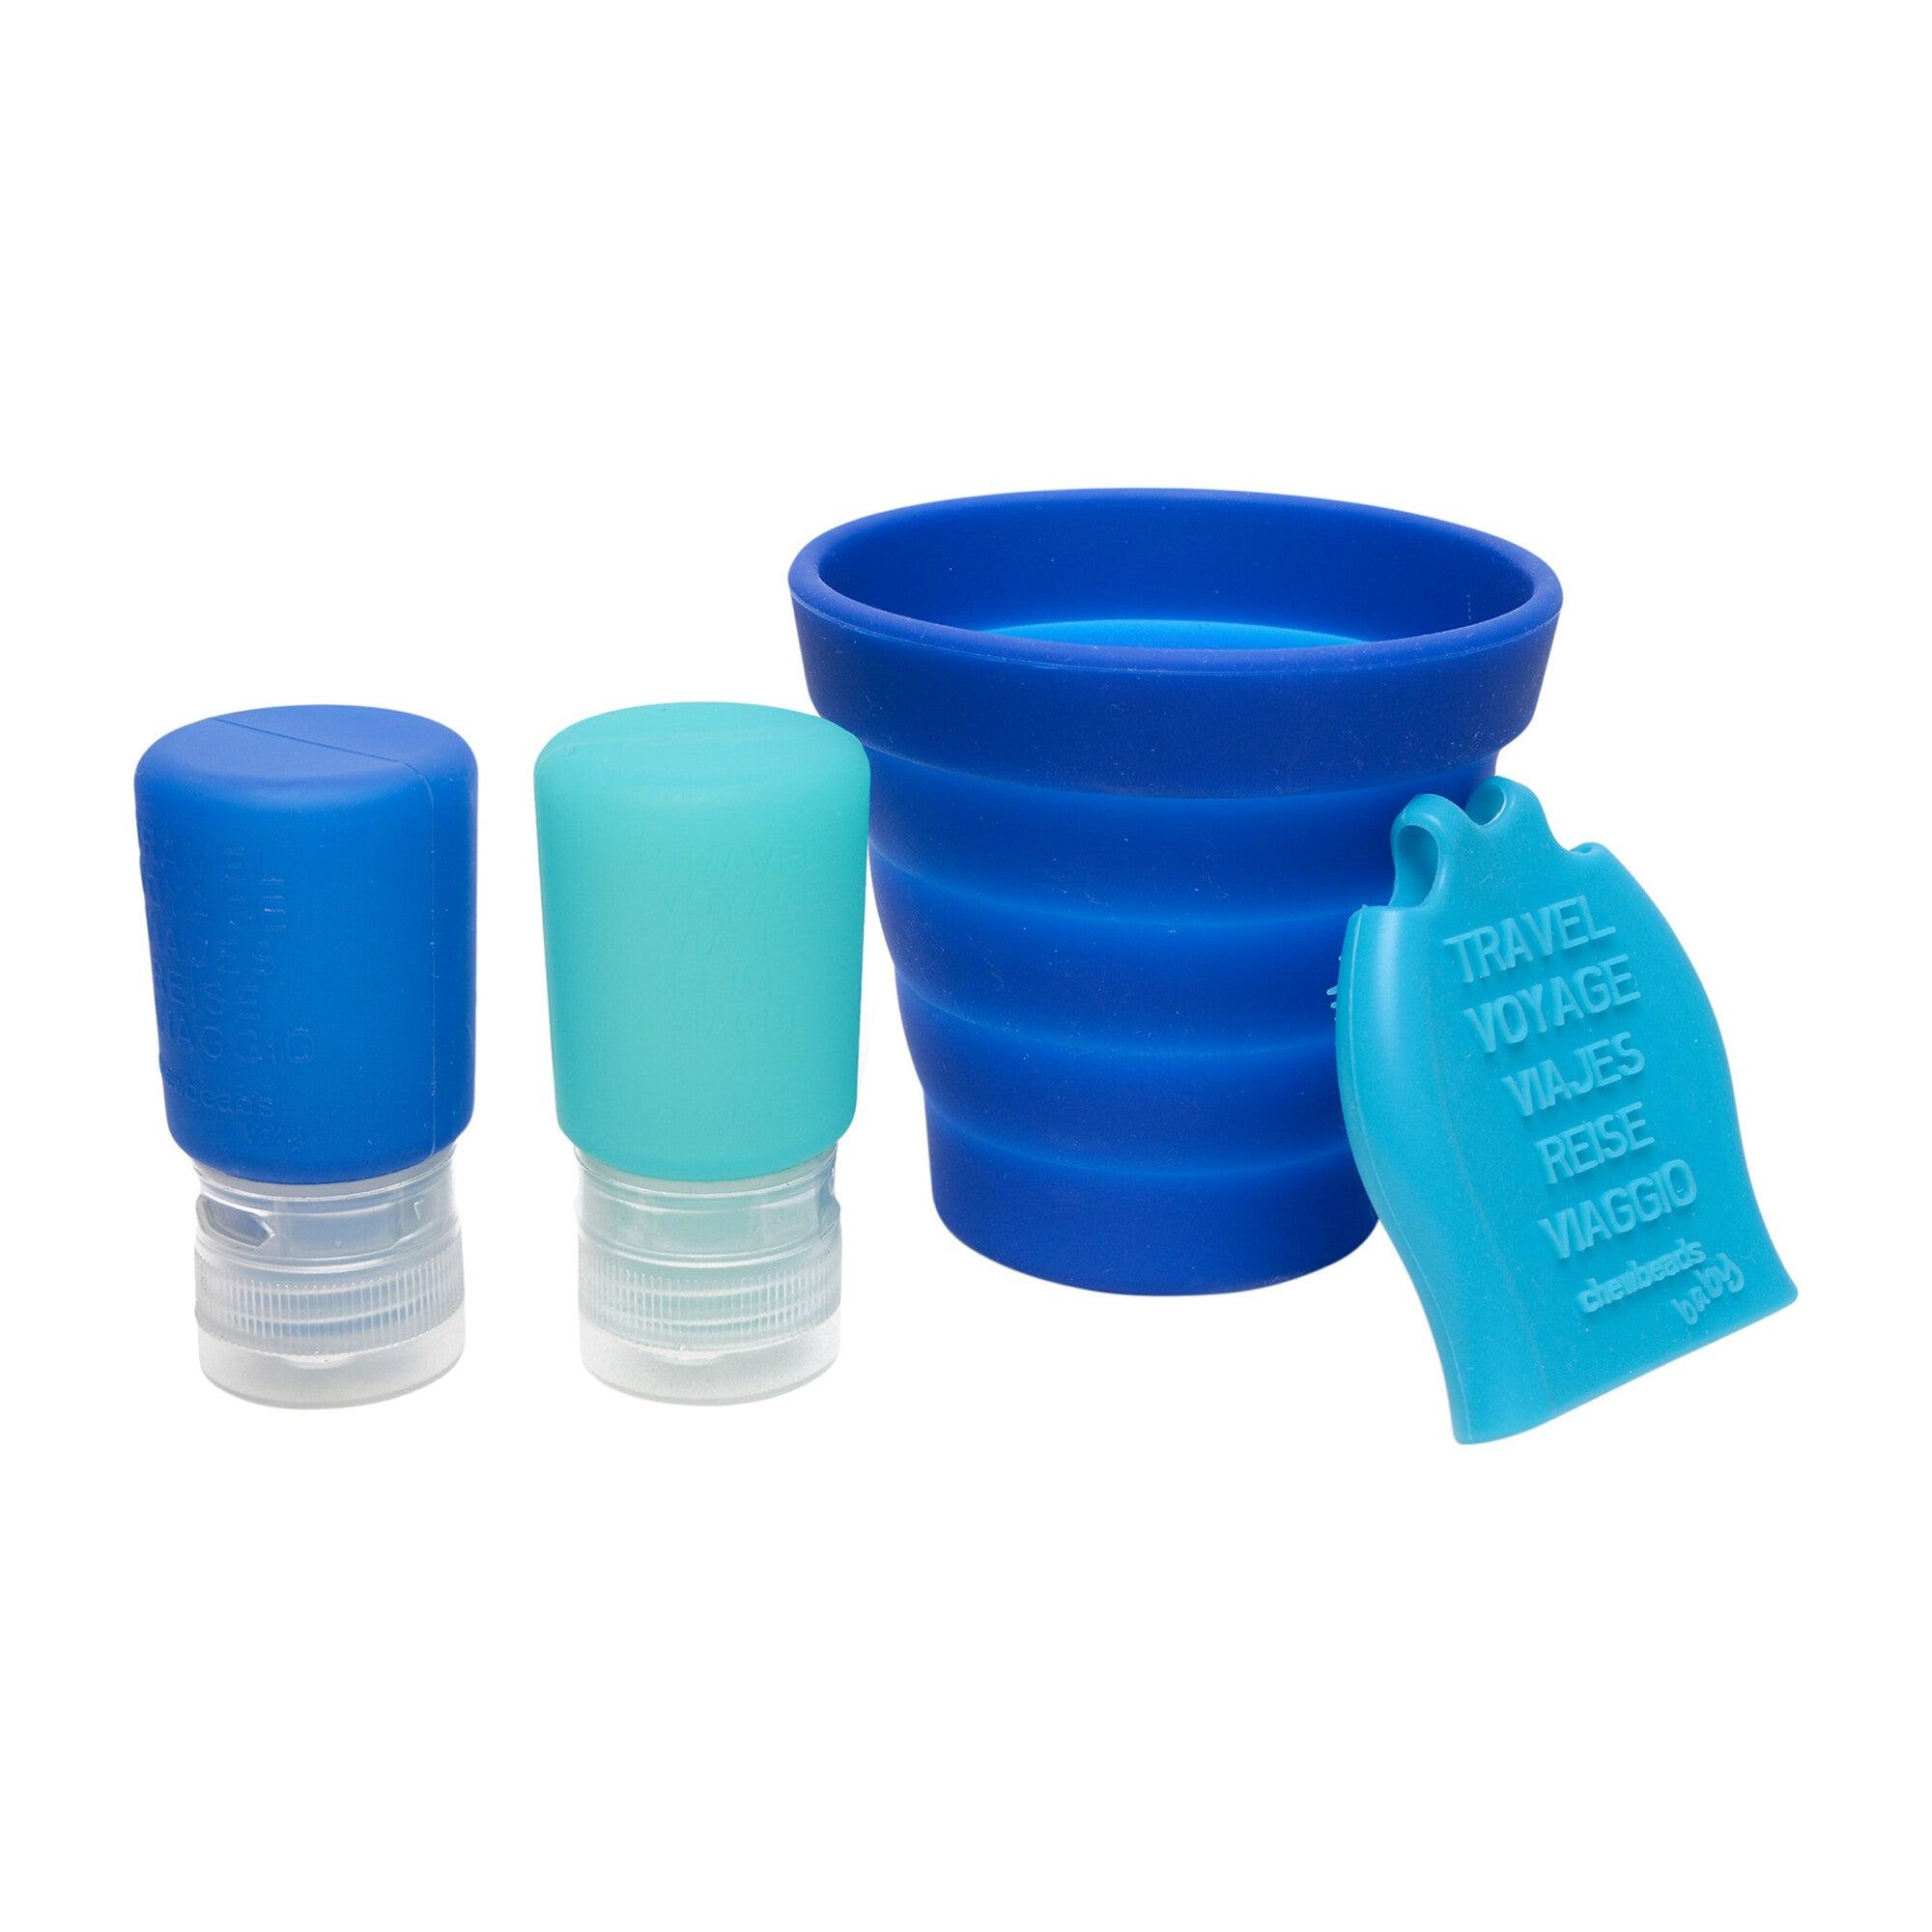 Tubby To Go Travel Bath Set, Blue